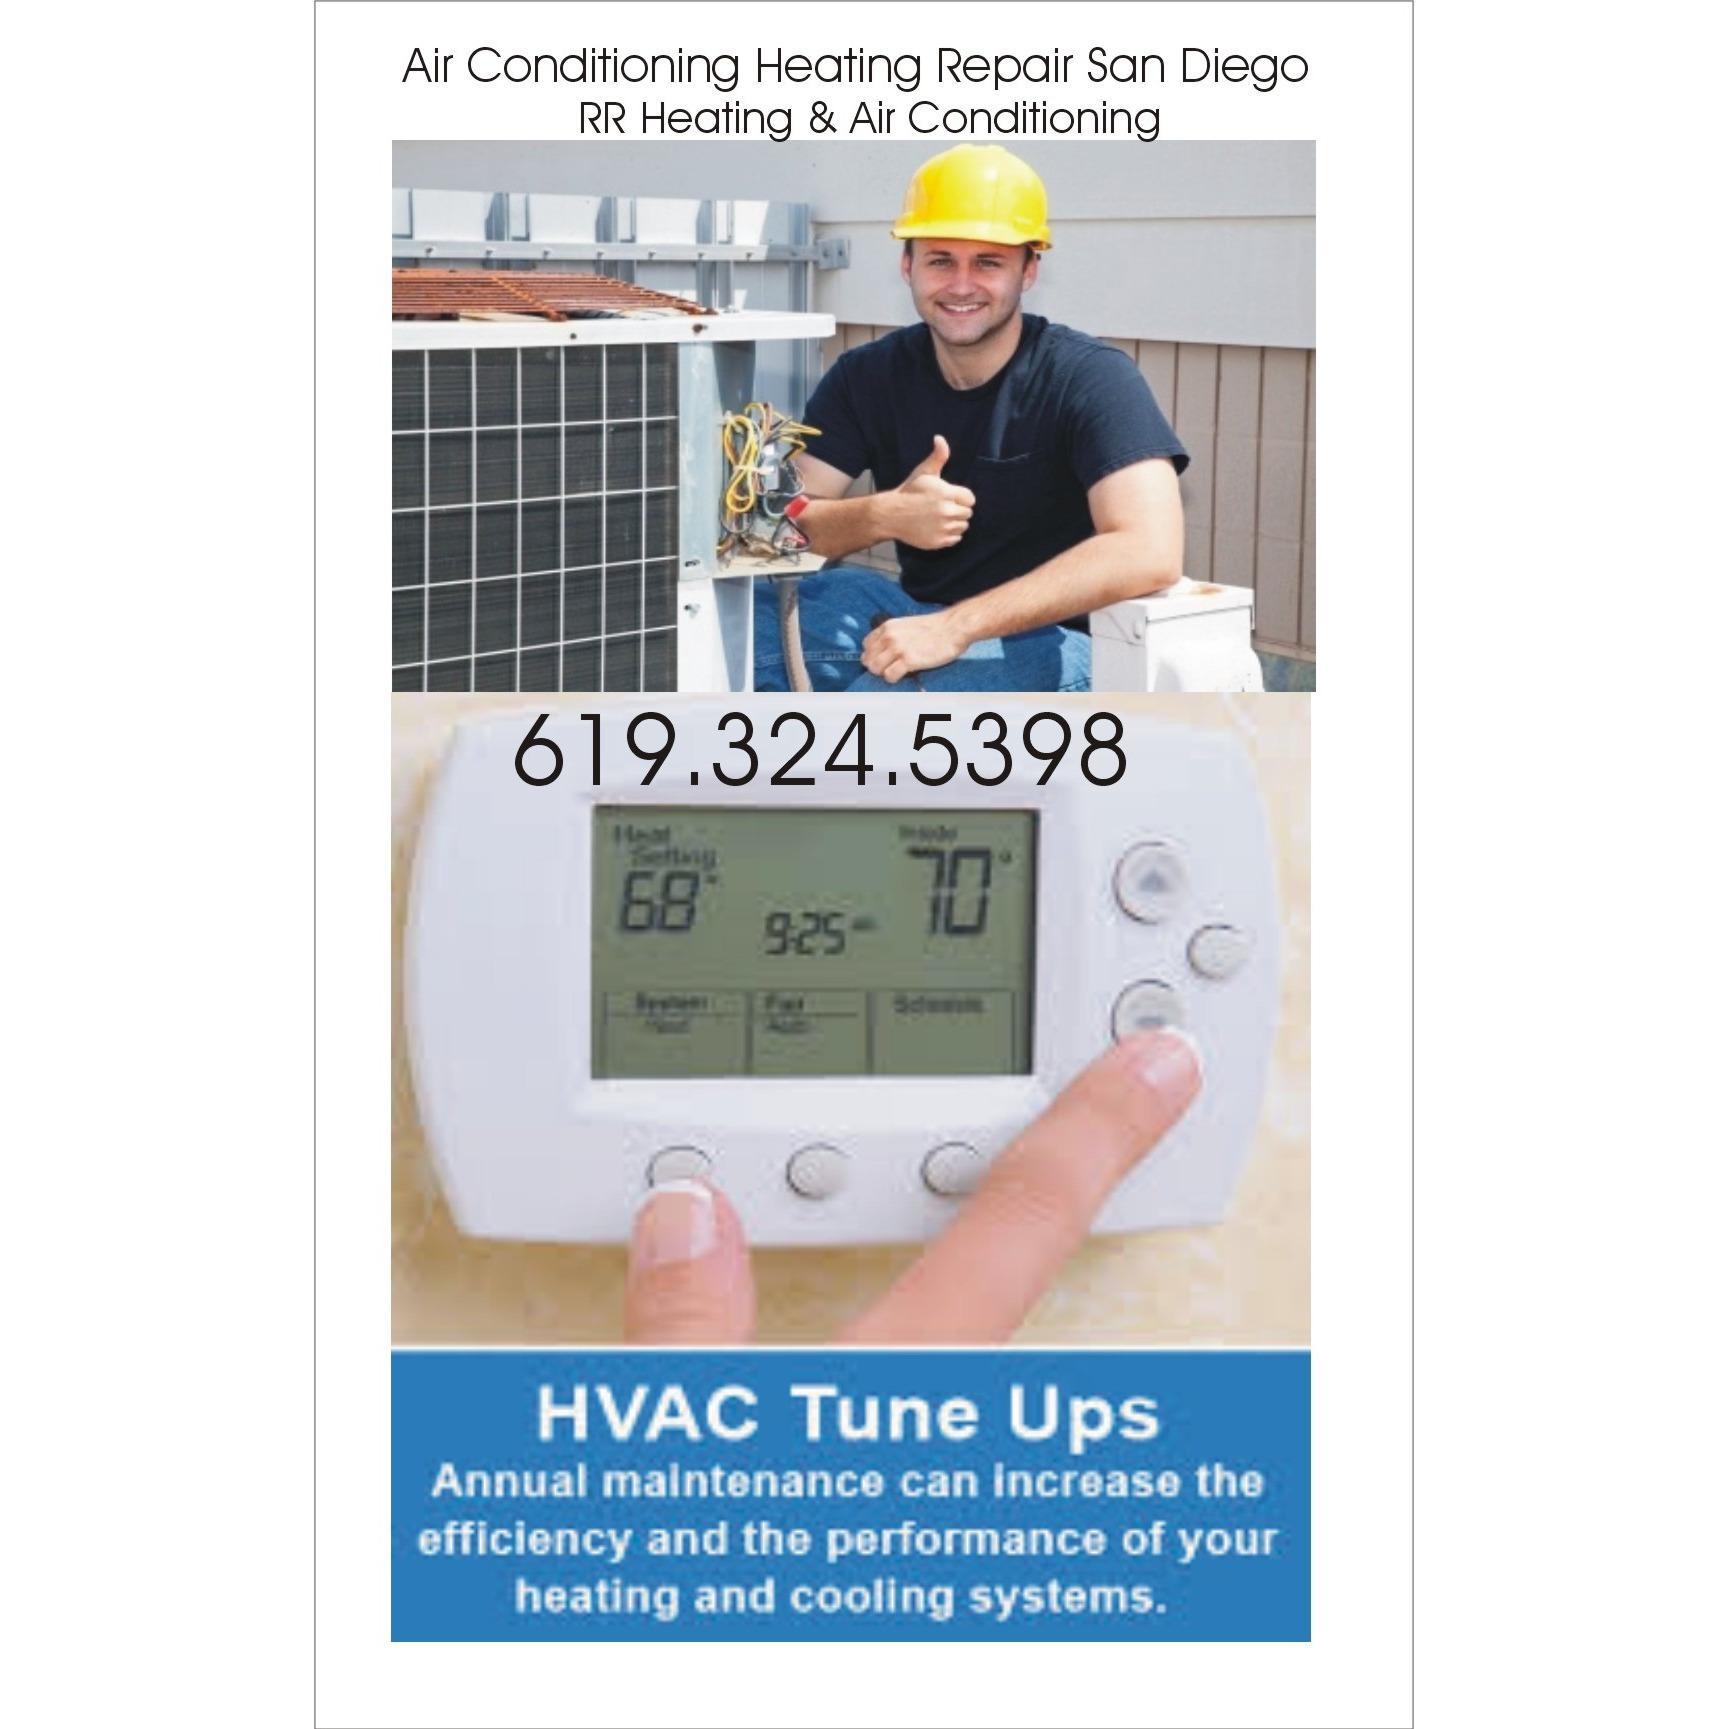 Air Conditioning Heating Repair San Diego